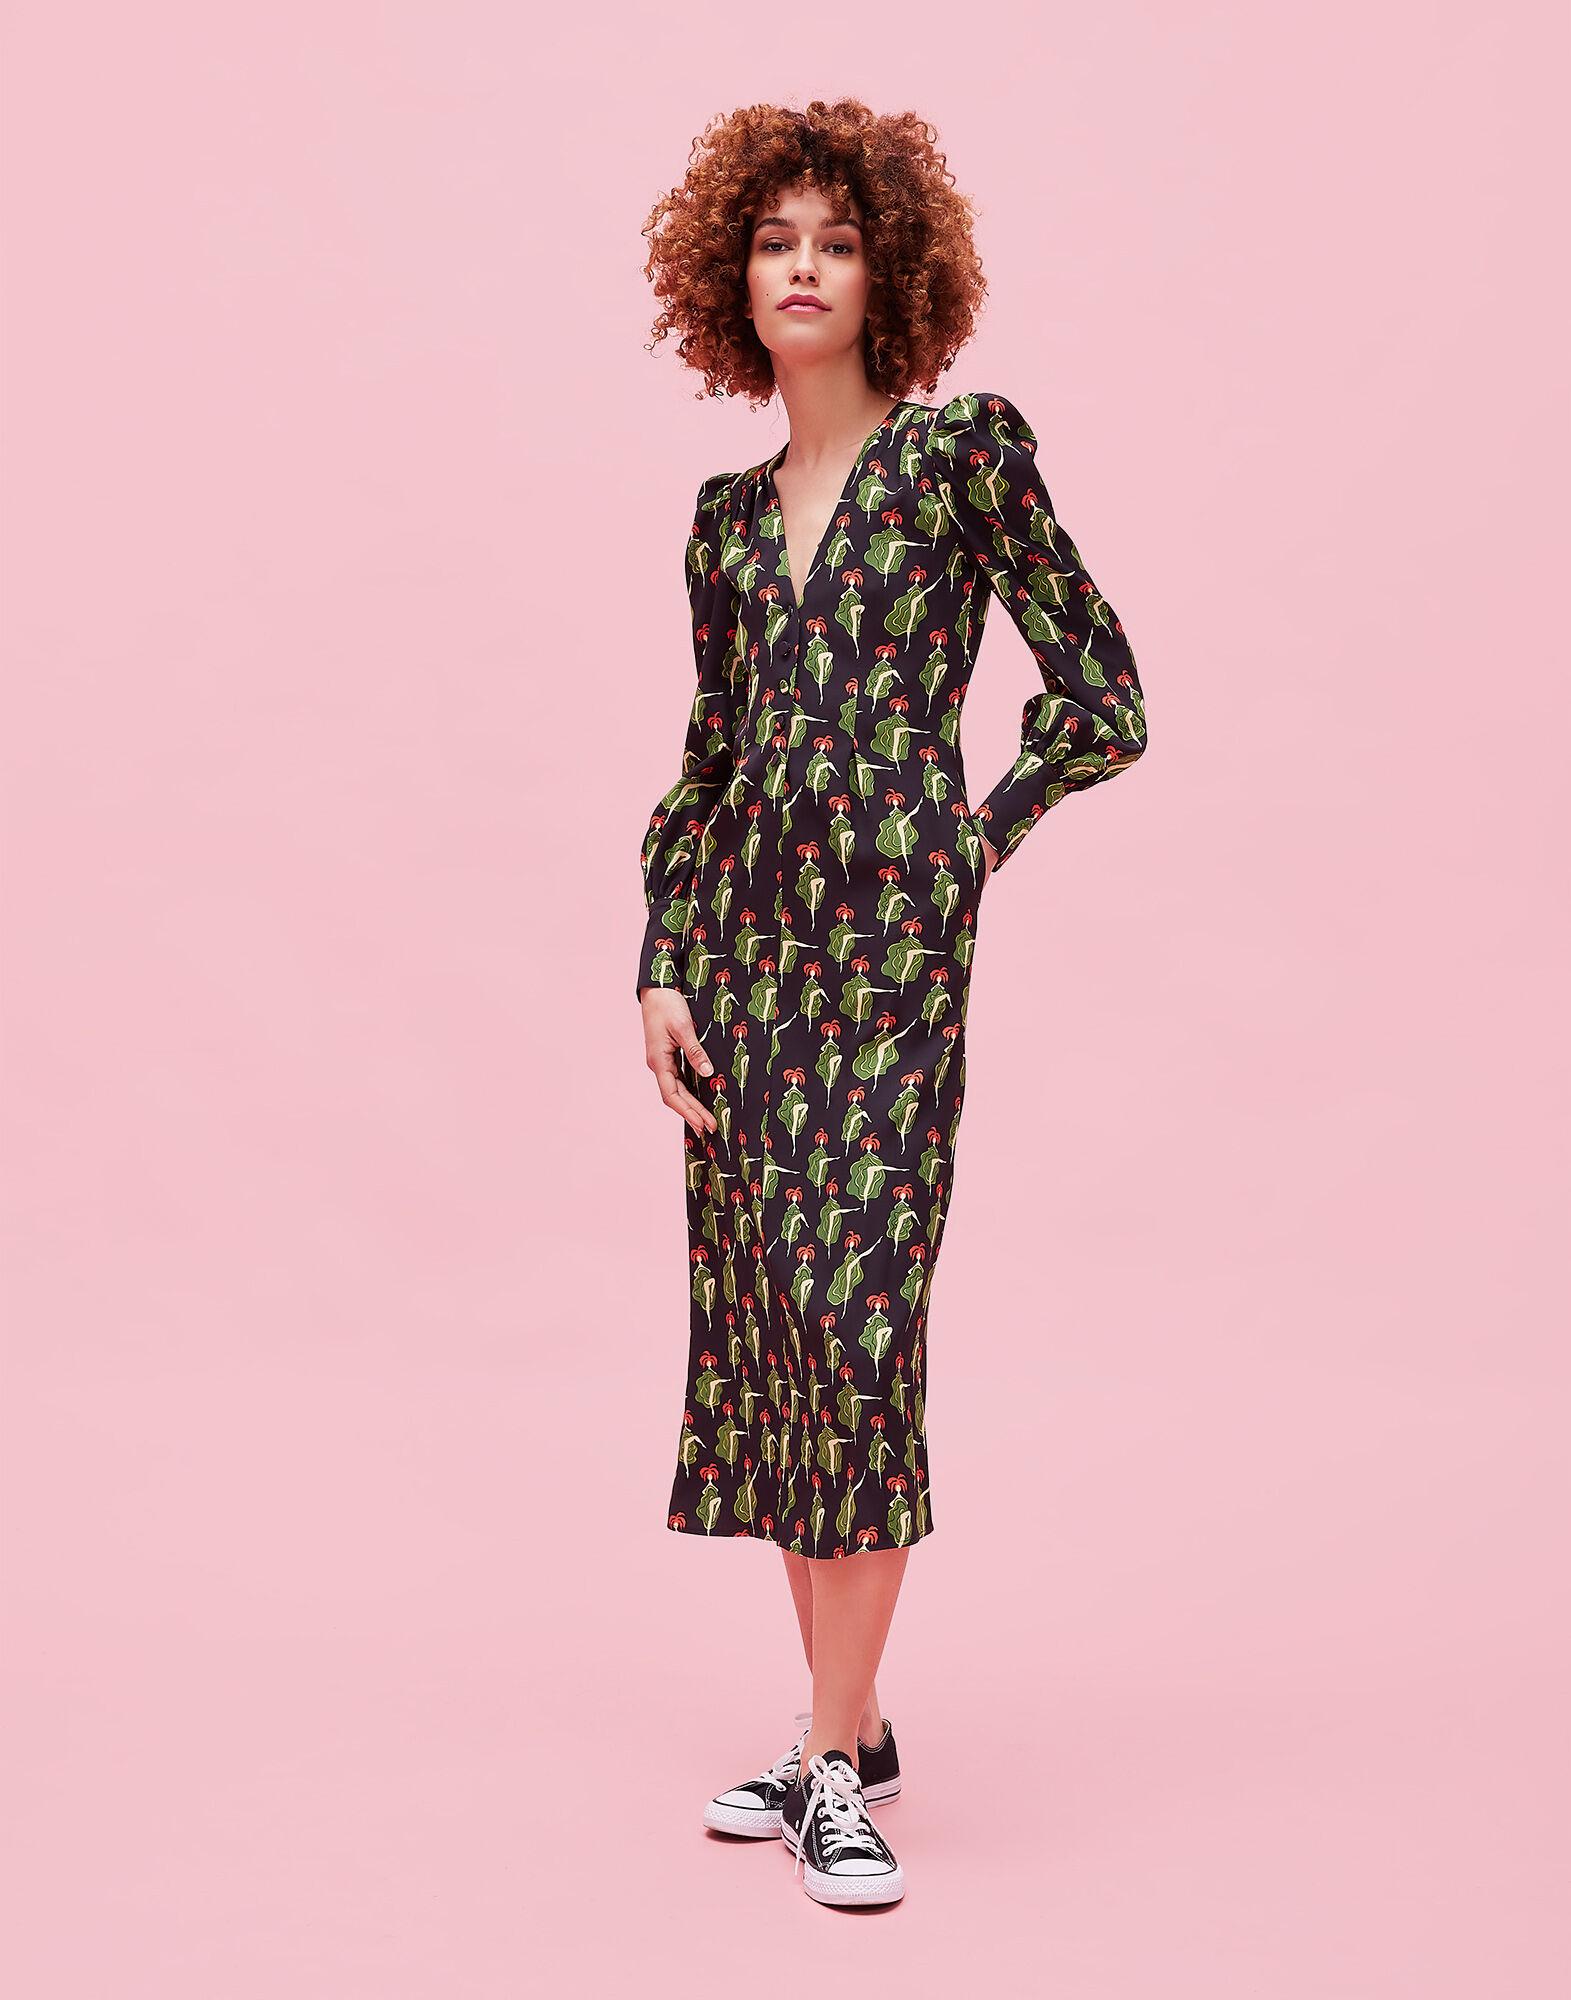 b0205a860827 La DoubleJ LDJ Editions Clothing - Dresses